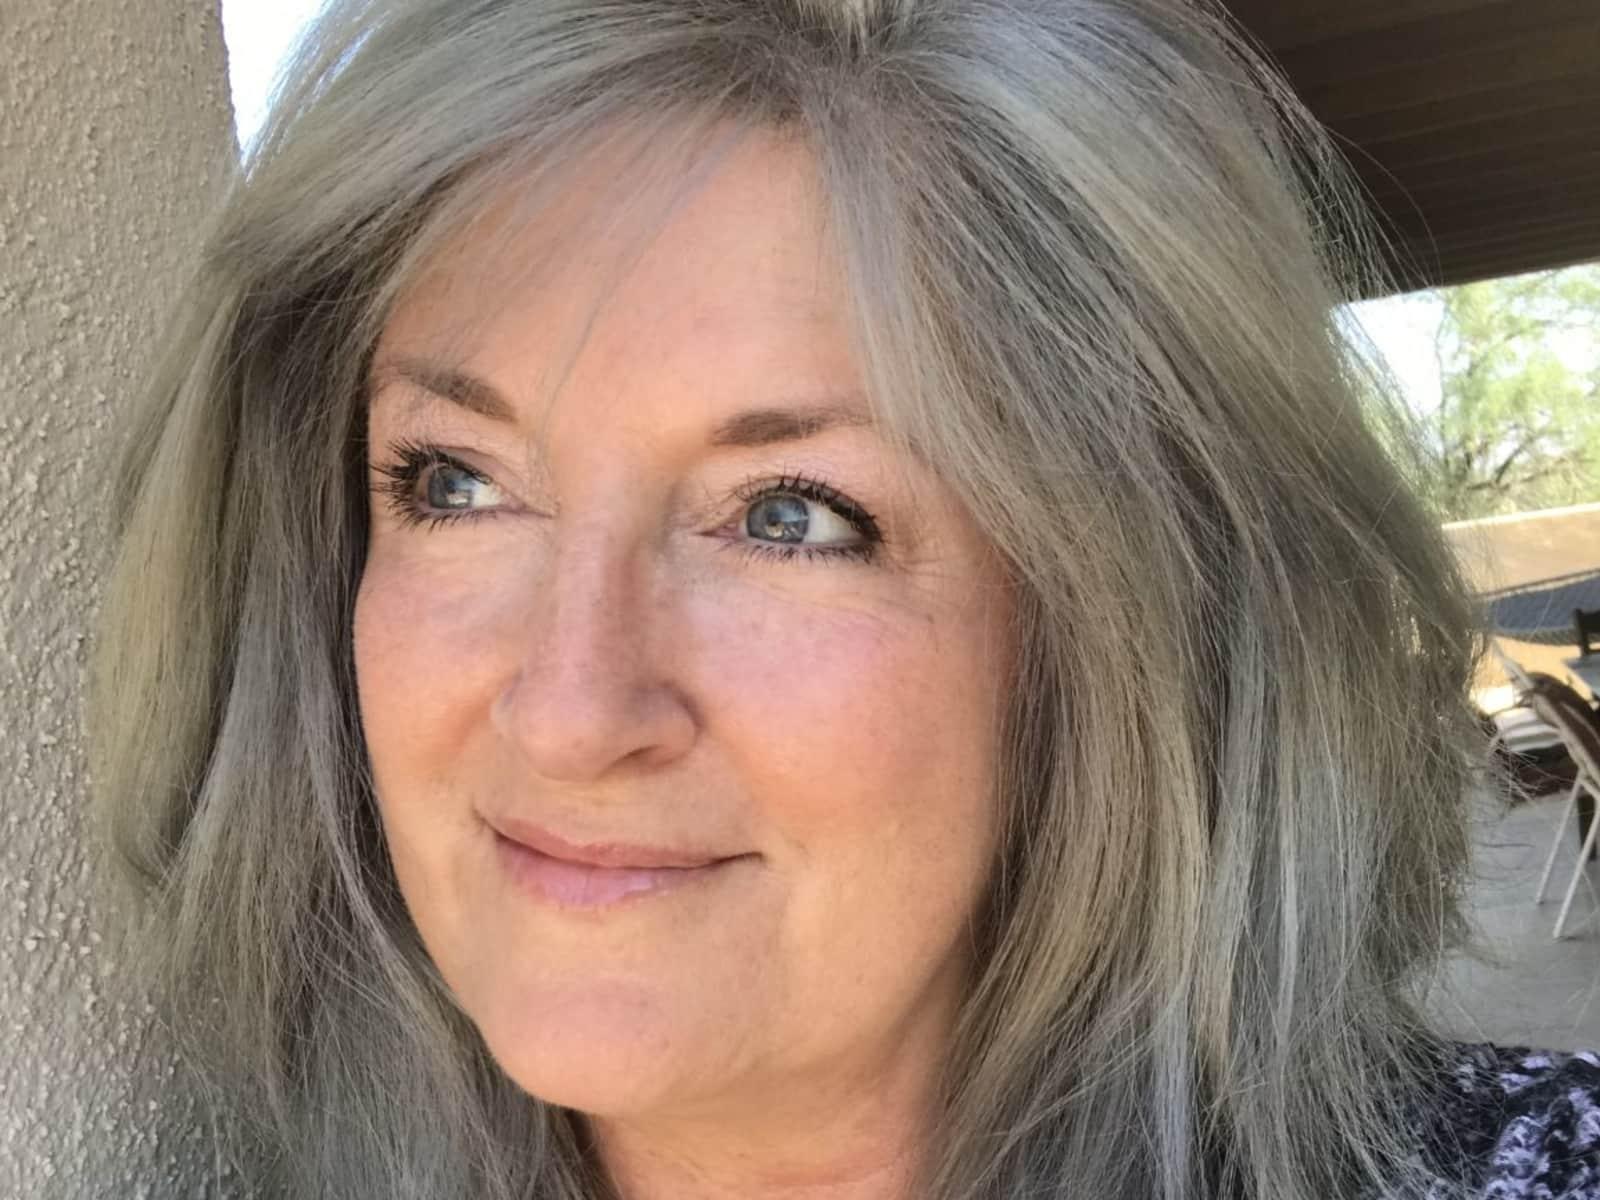 Patty from San Luis Obispo, California, United States